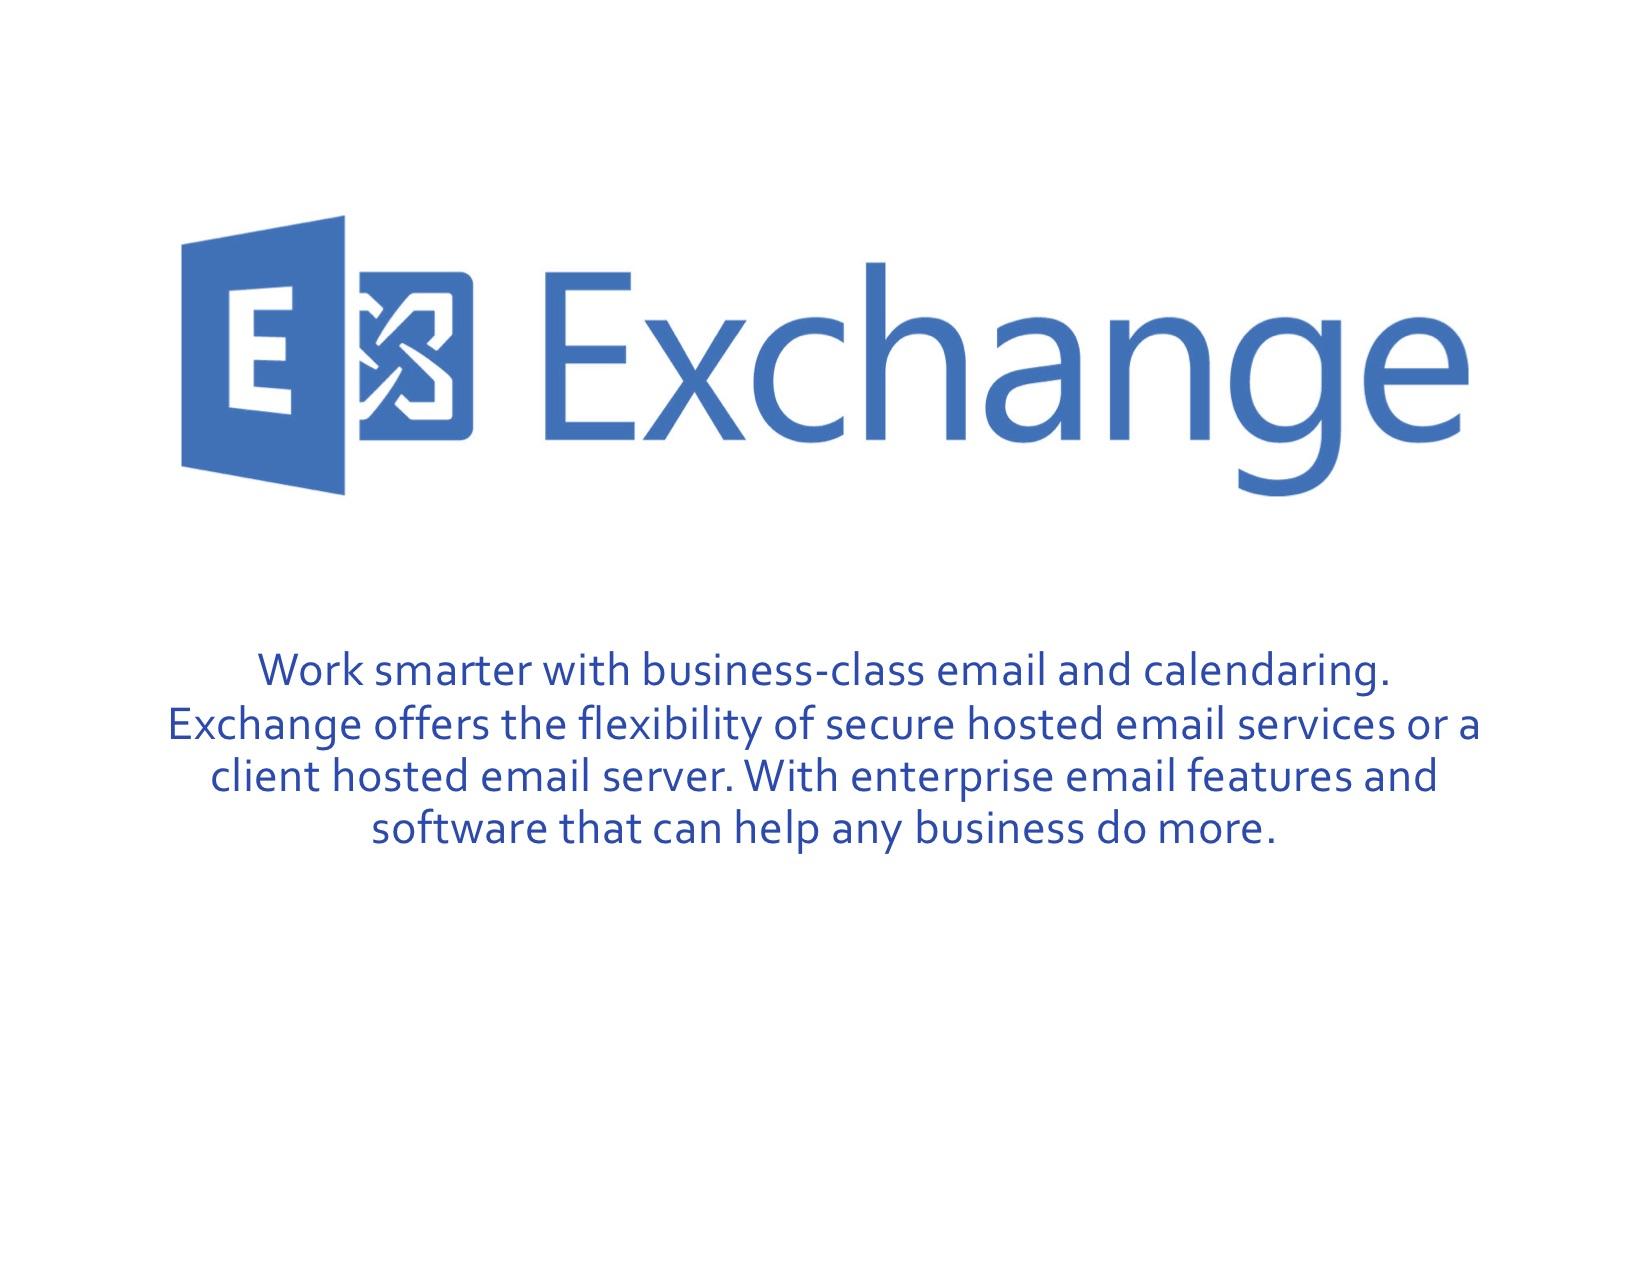 Microsoft Exchange.jpg